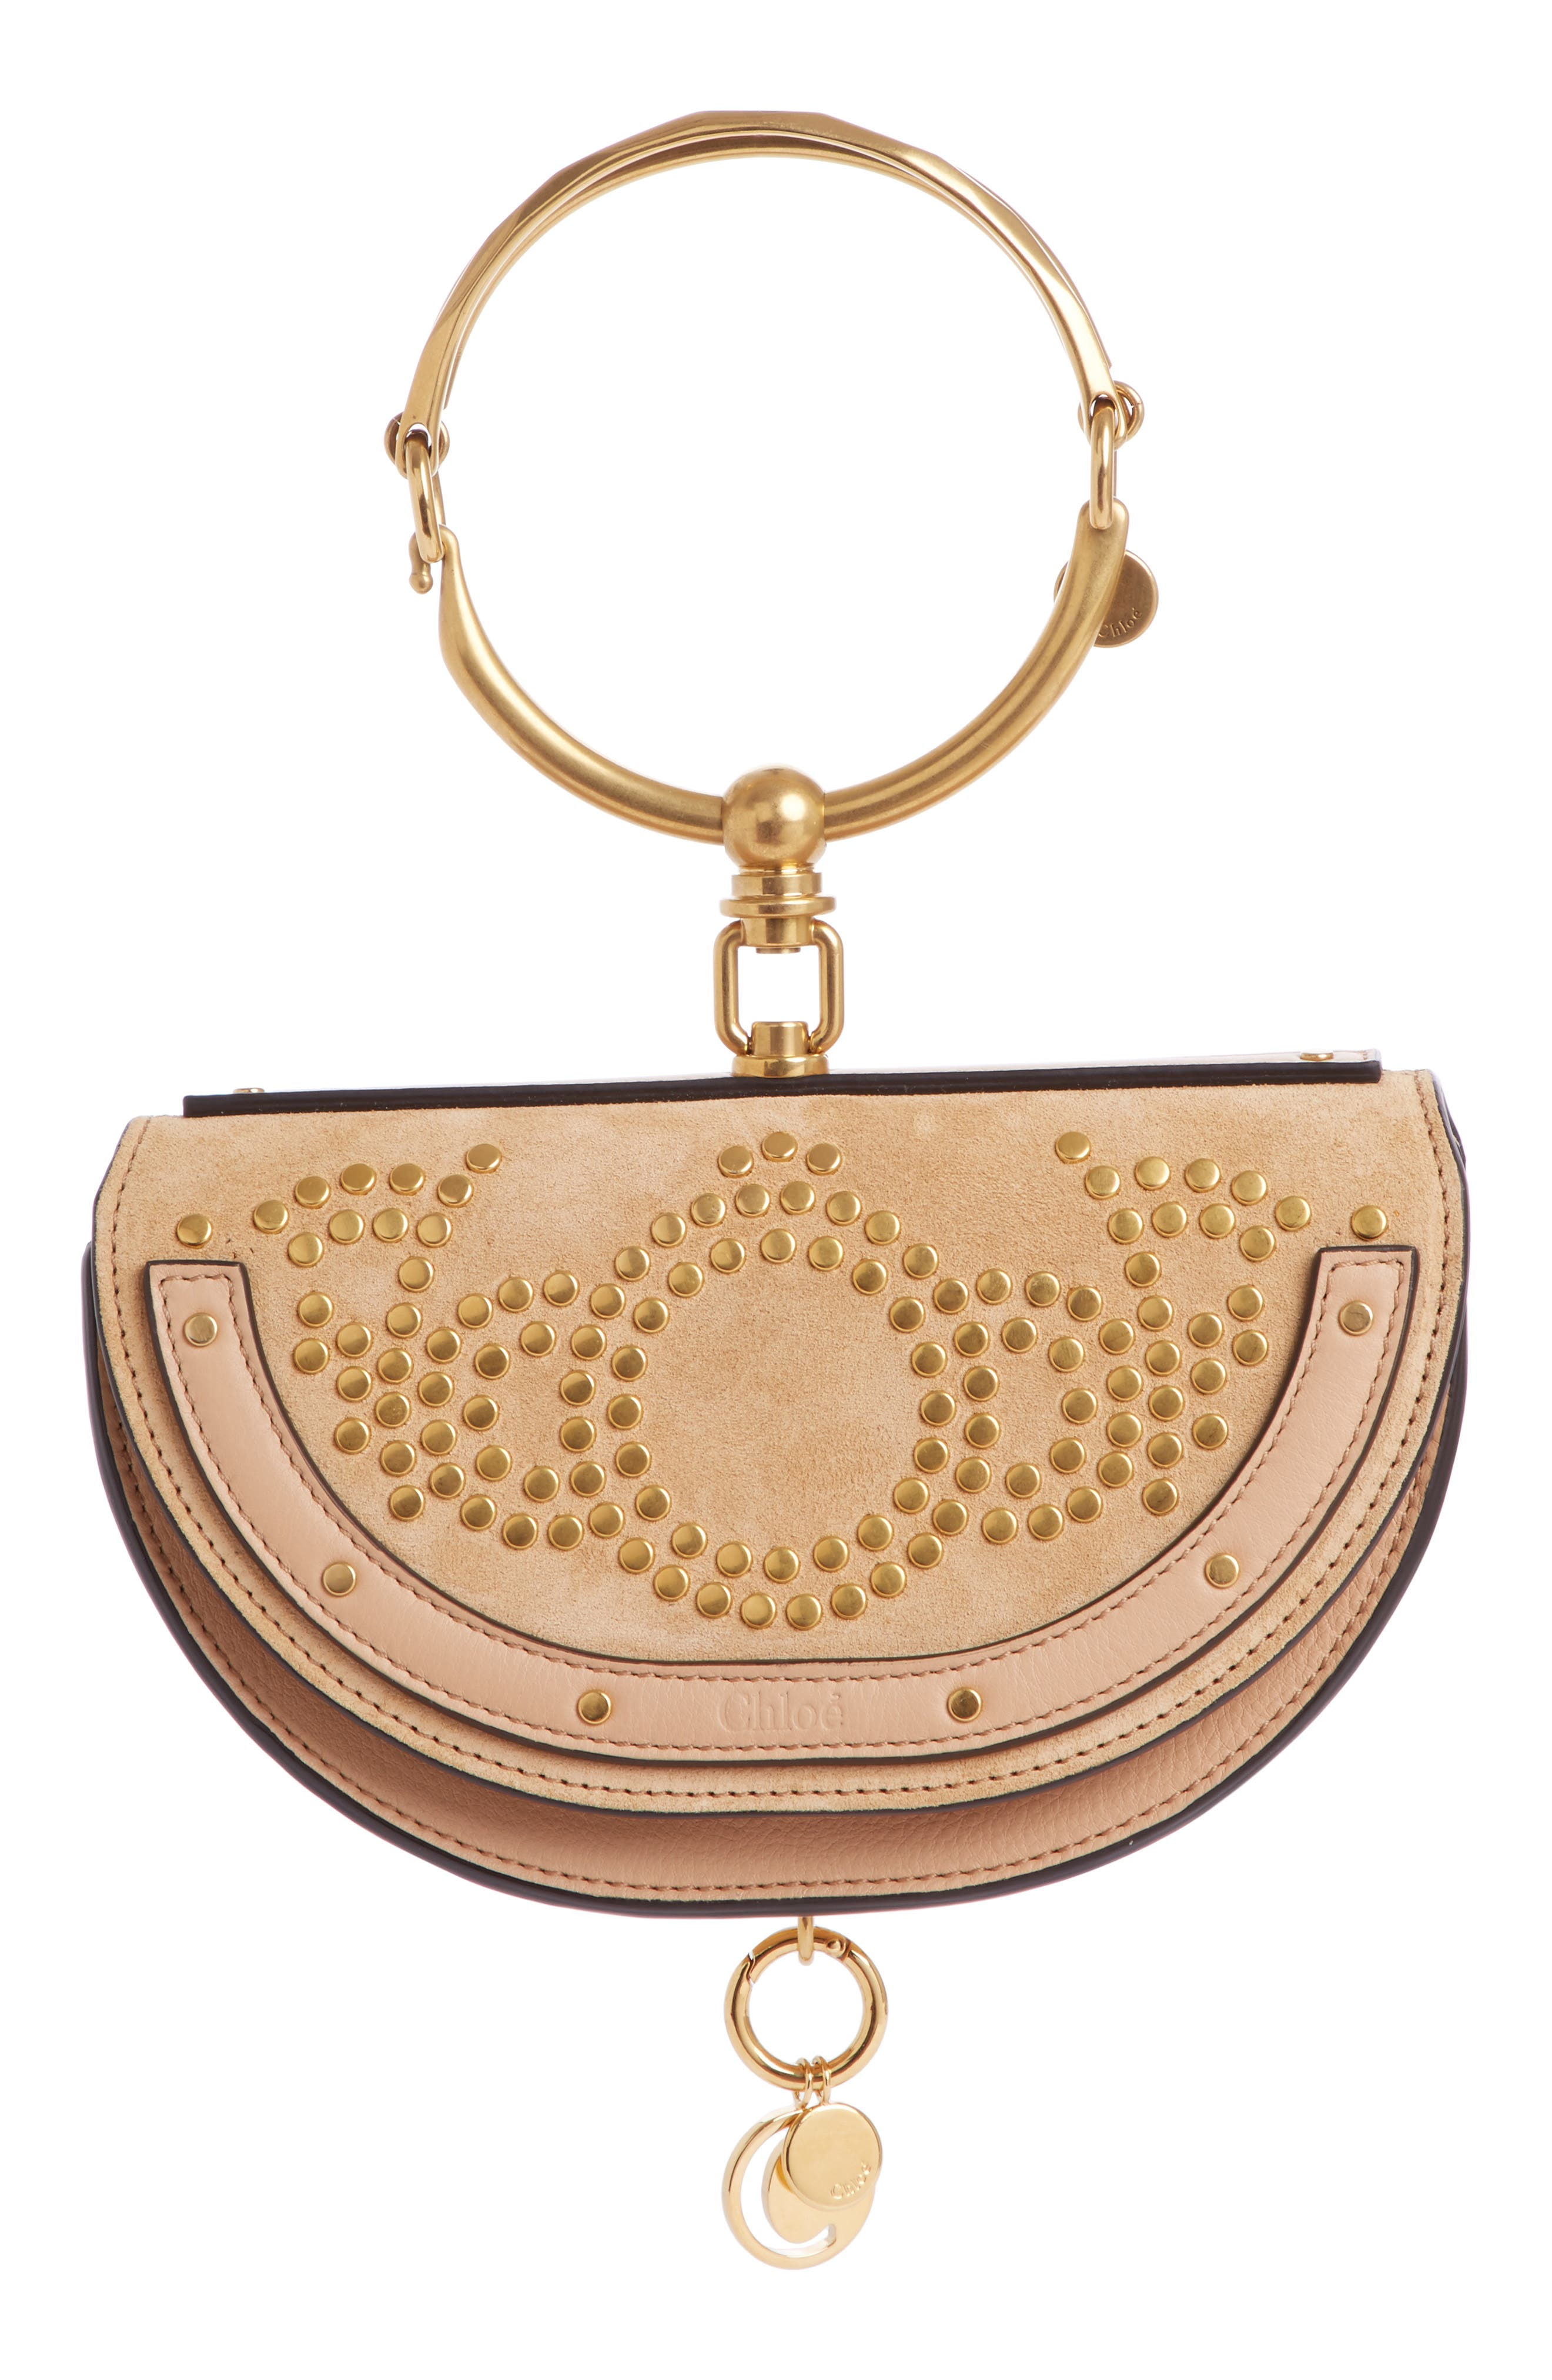 CHLOÉ Small Nile Studded Suede & Leather Crossbody Bag